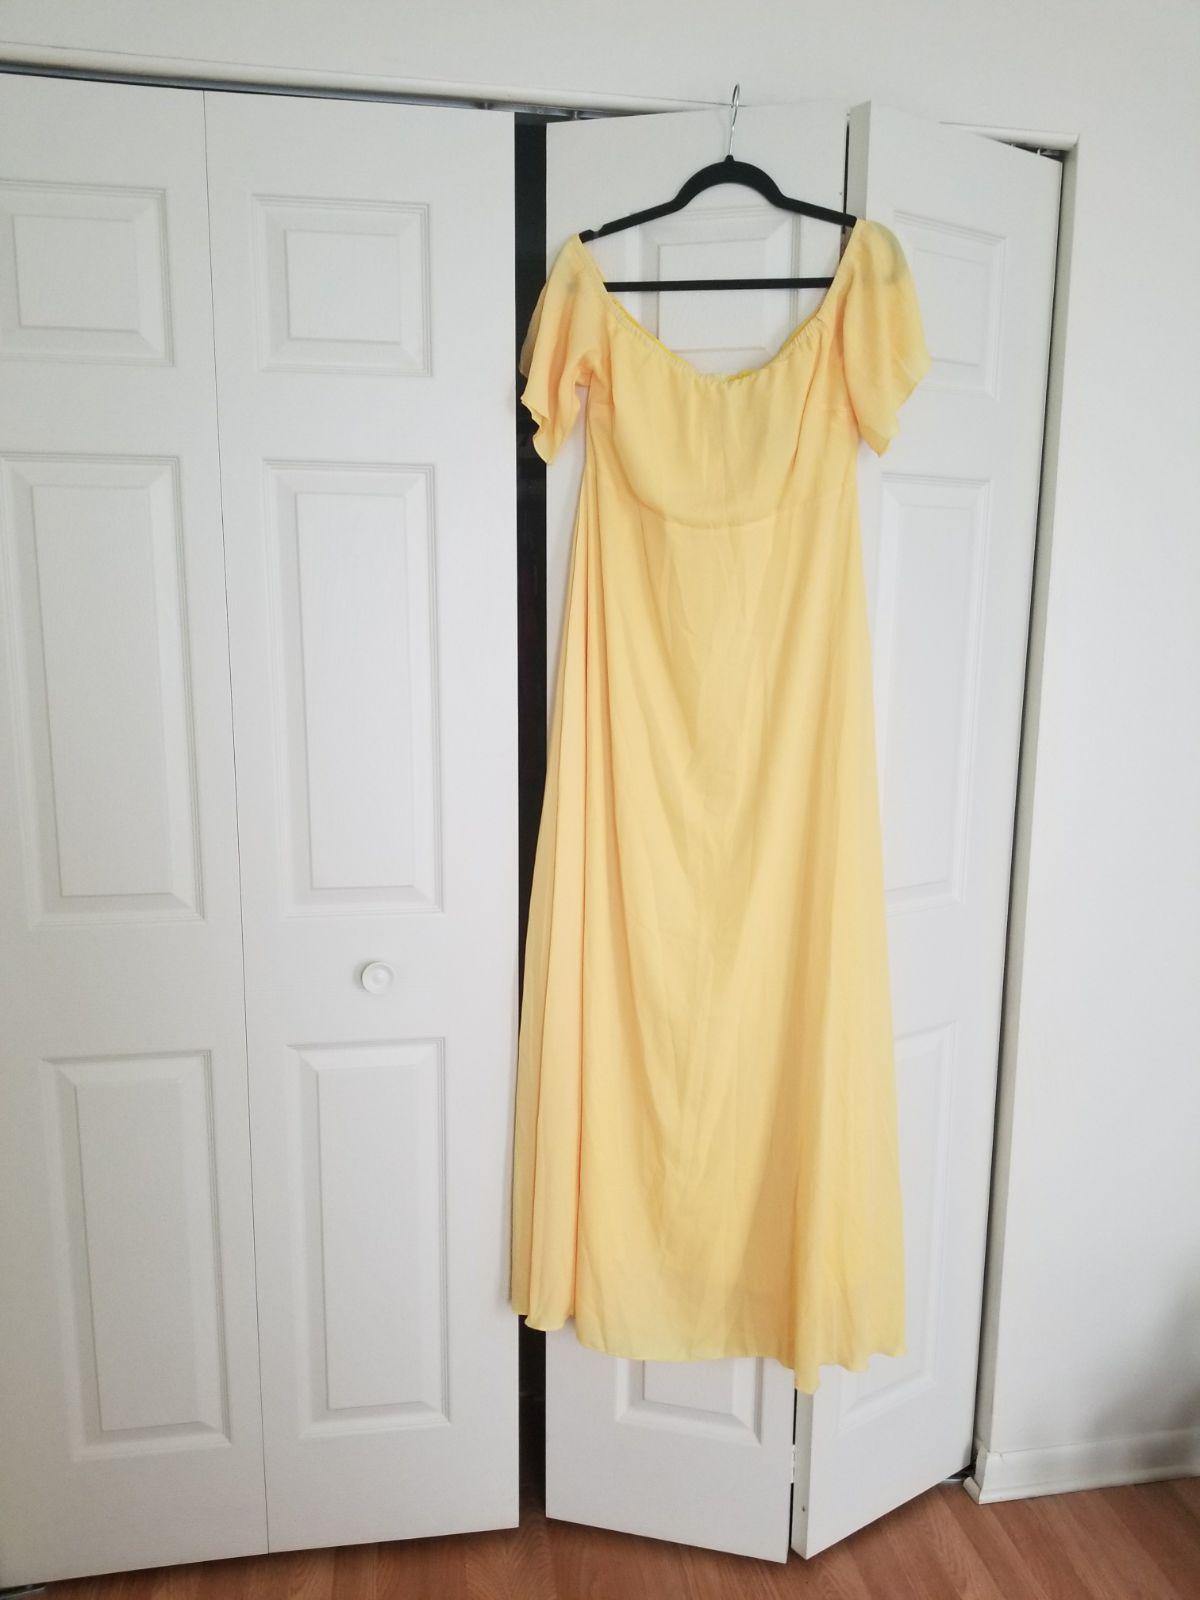 Yellow maternity dress mercari buy sell things you love yellow maternity dress ombrellifo Images